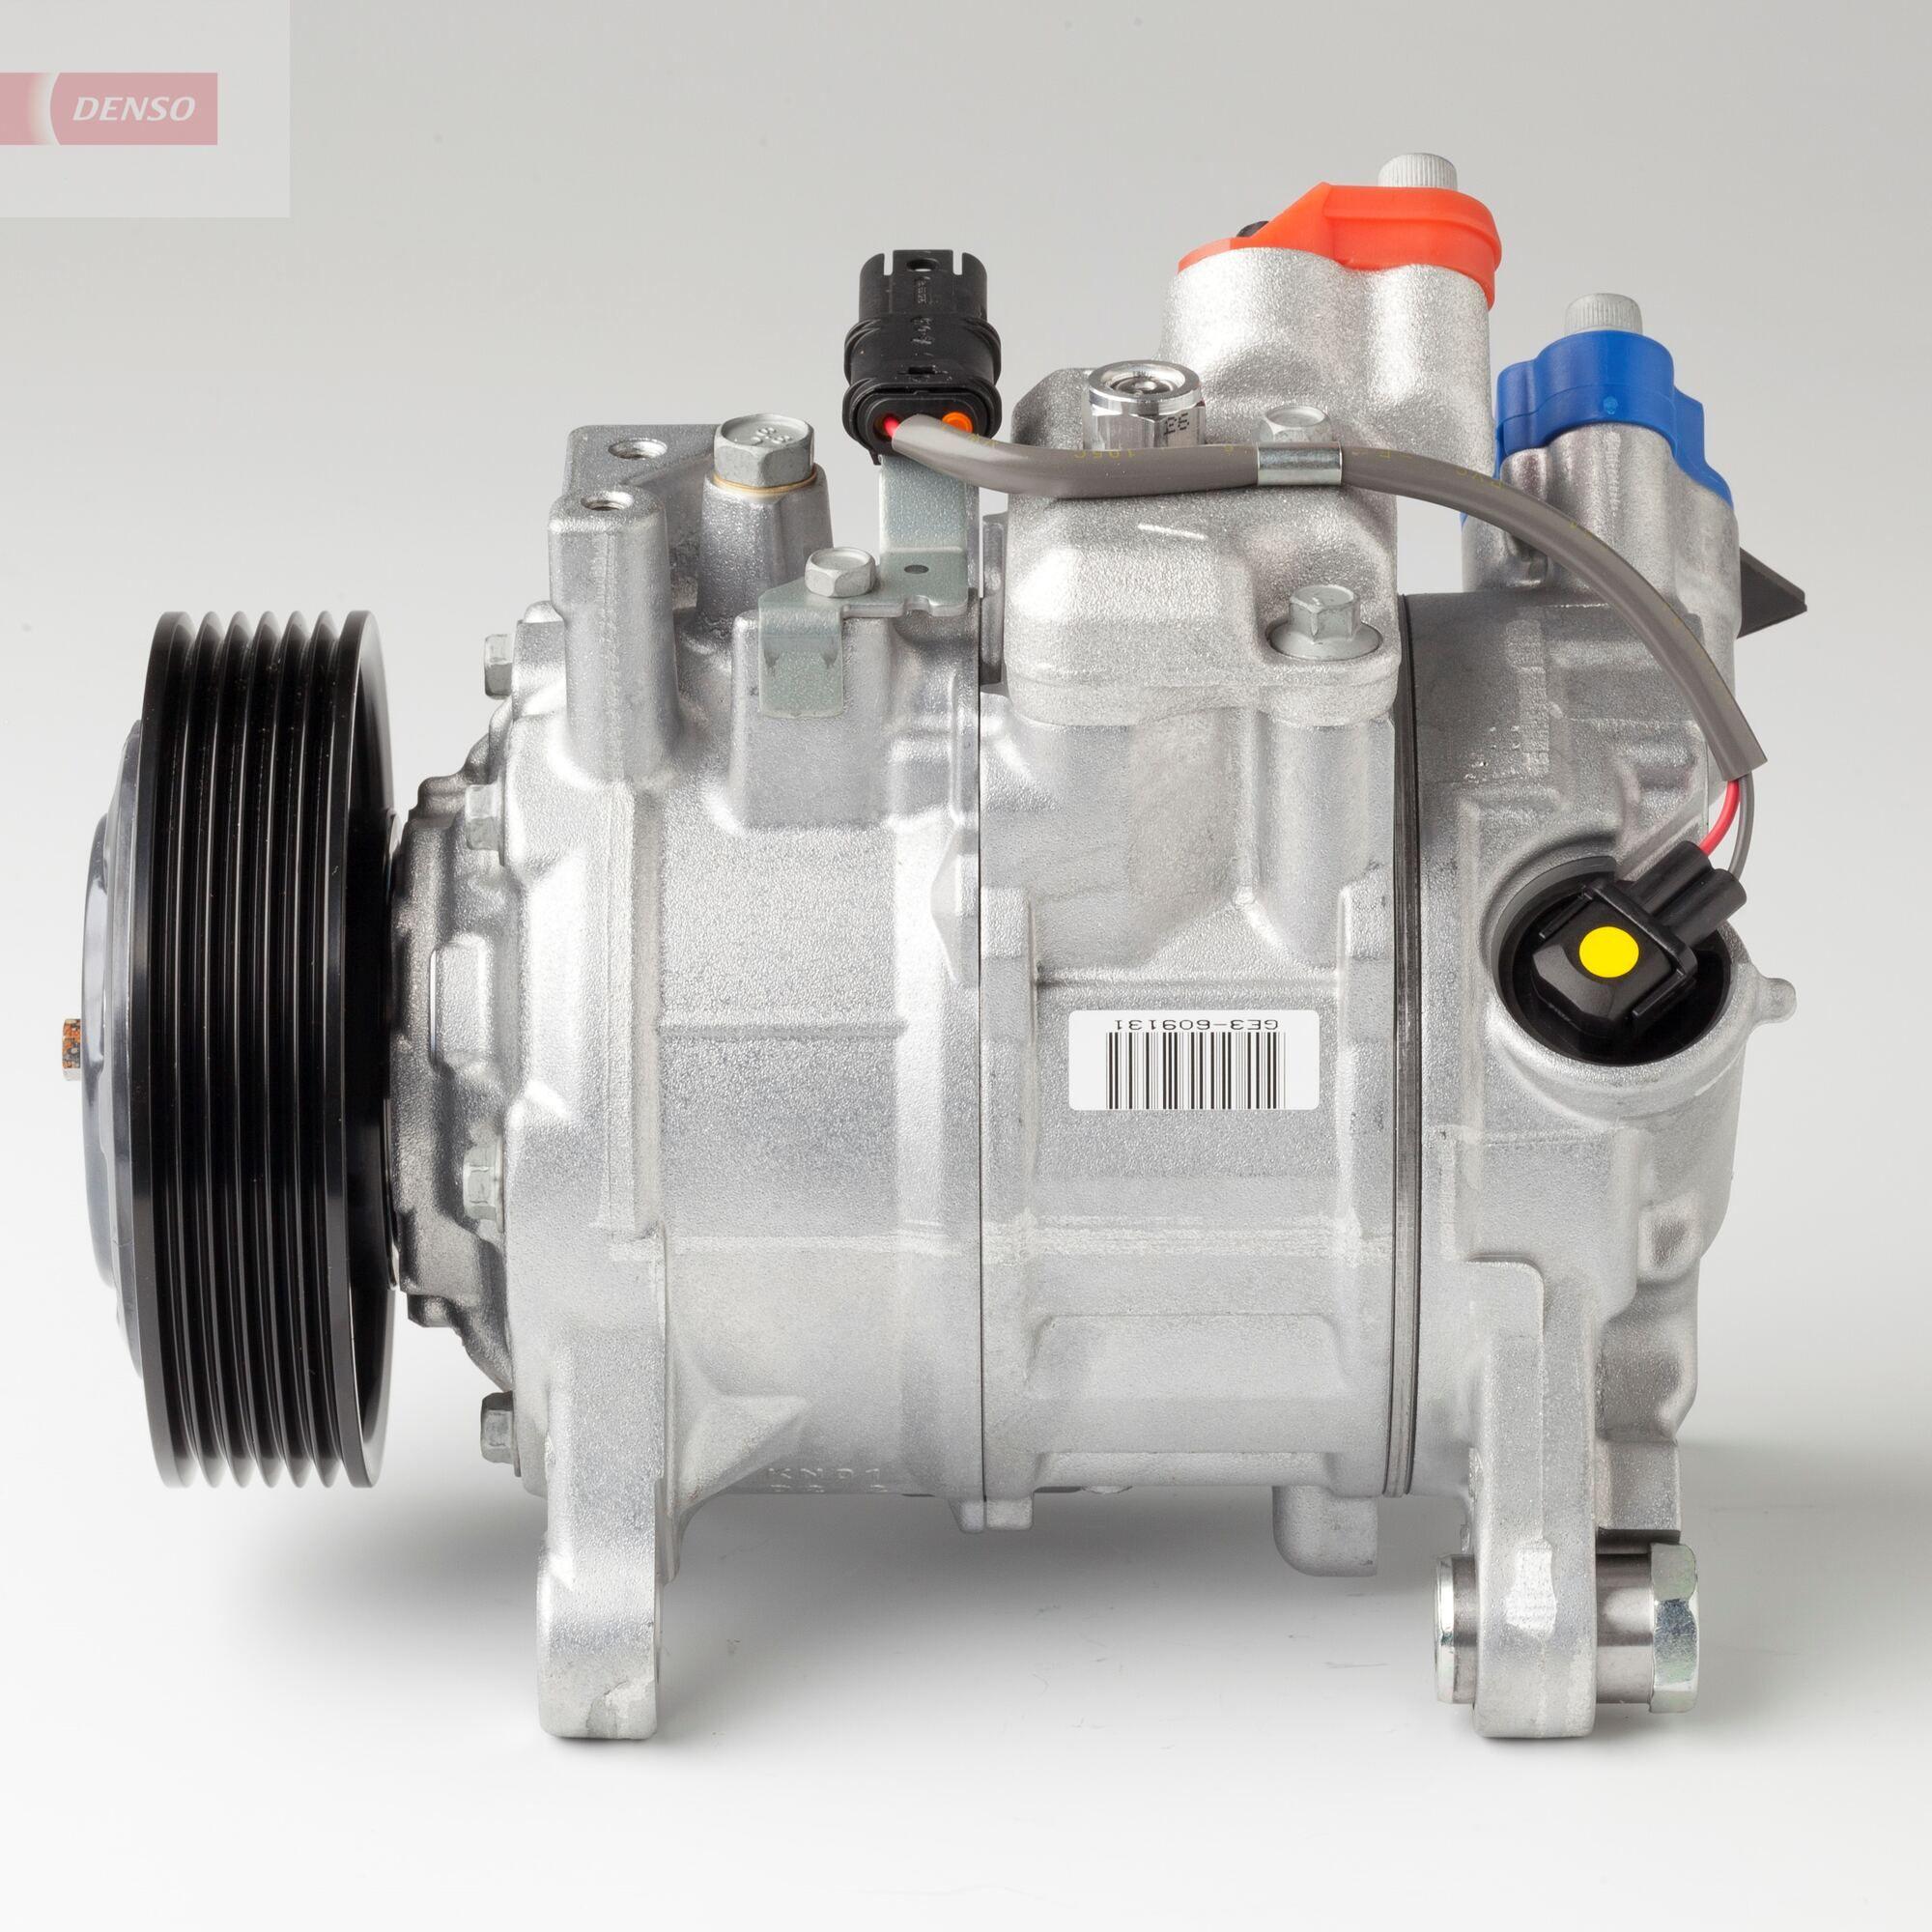 Original BMW Kompressor Klimaanlage DCP05091